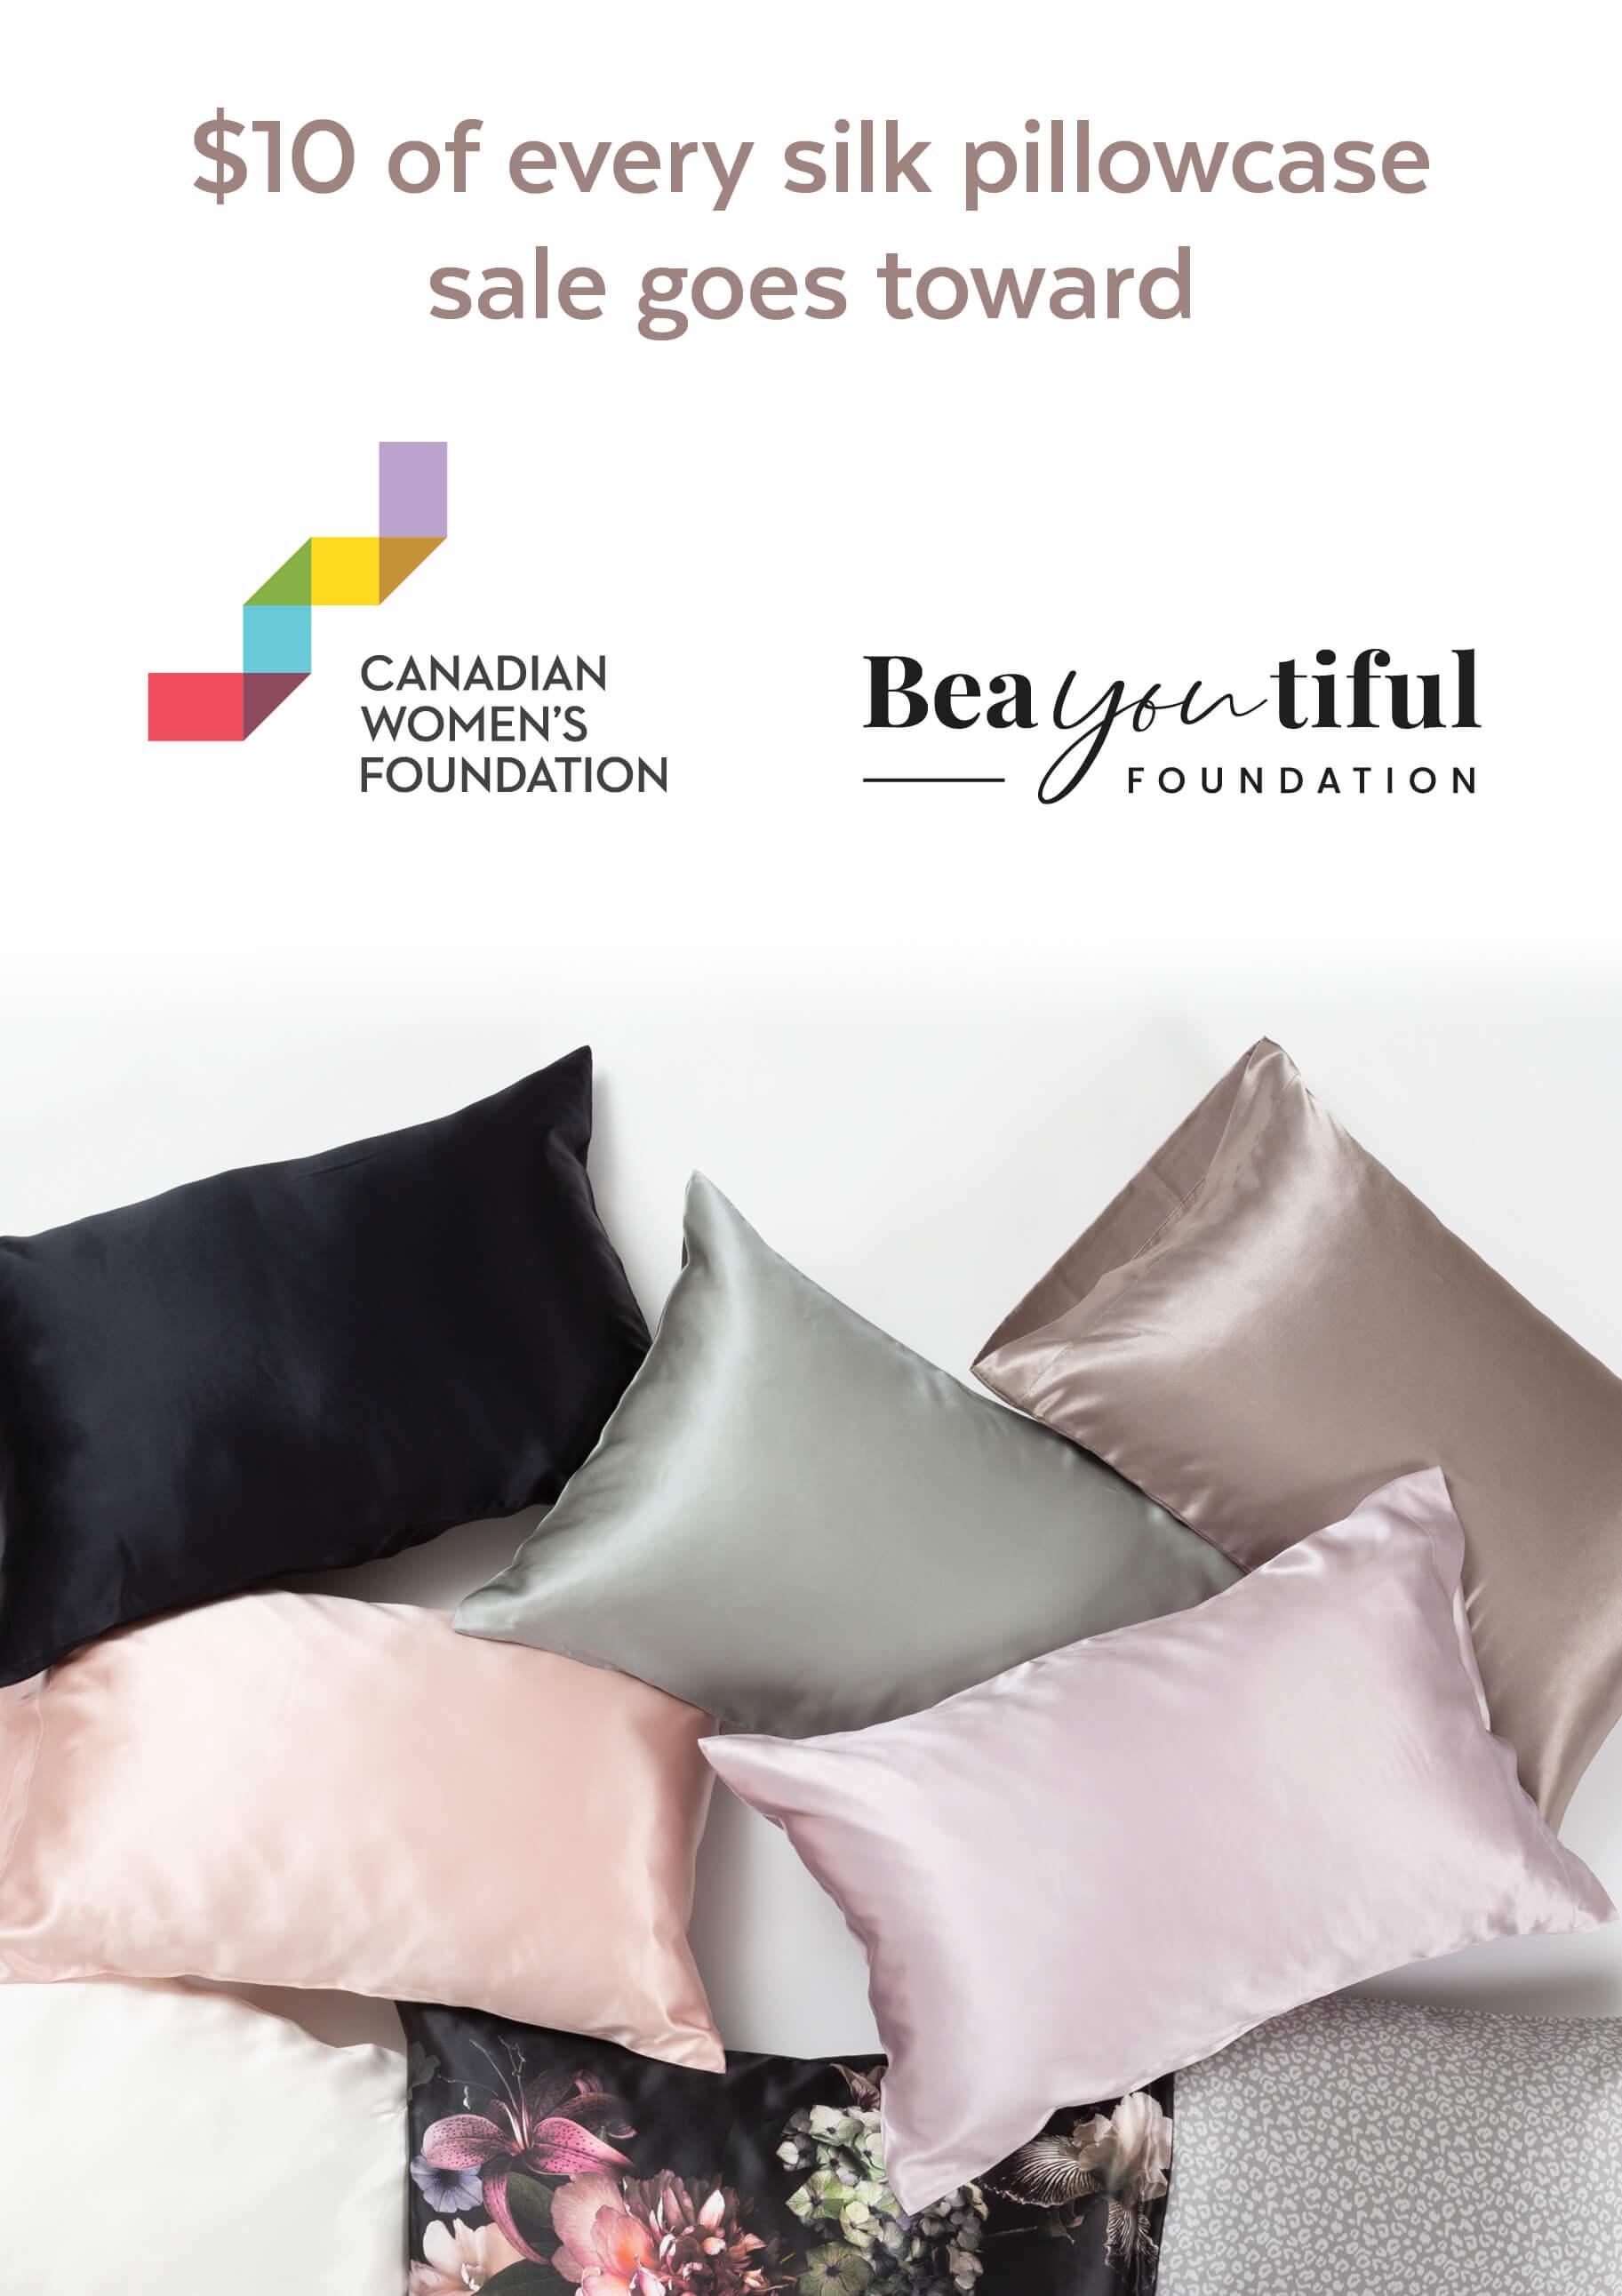 Mulberry Silk Pillowcases